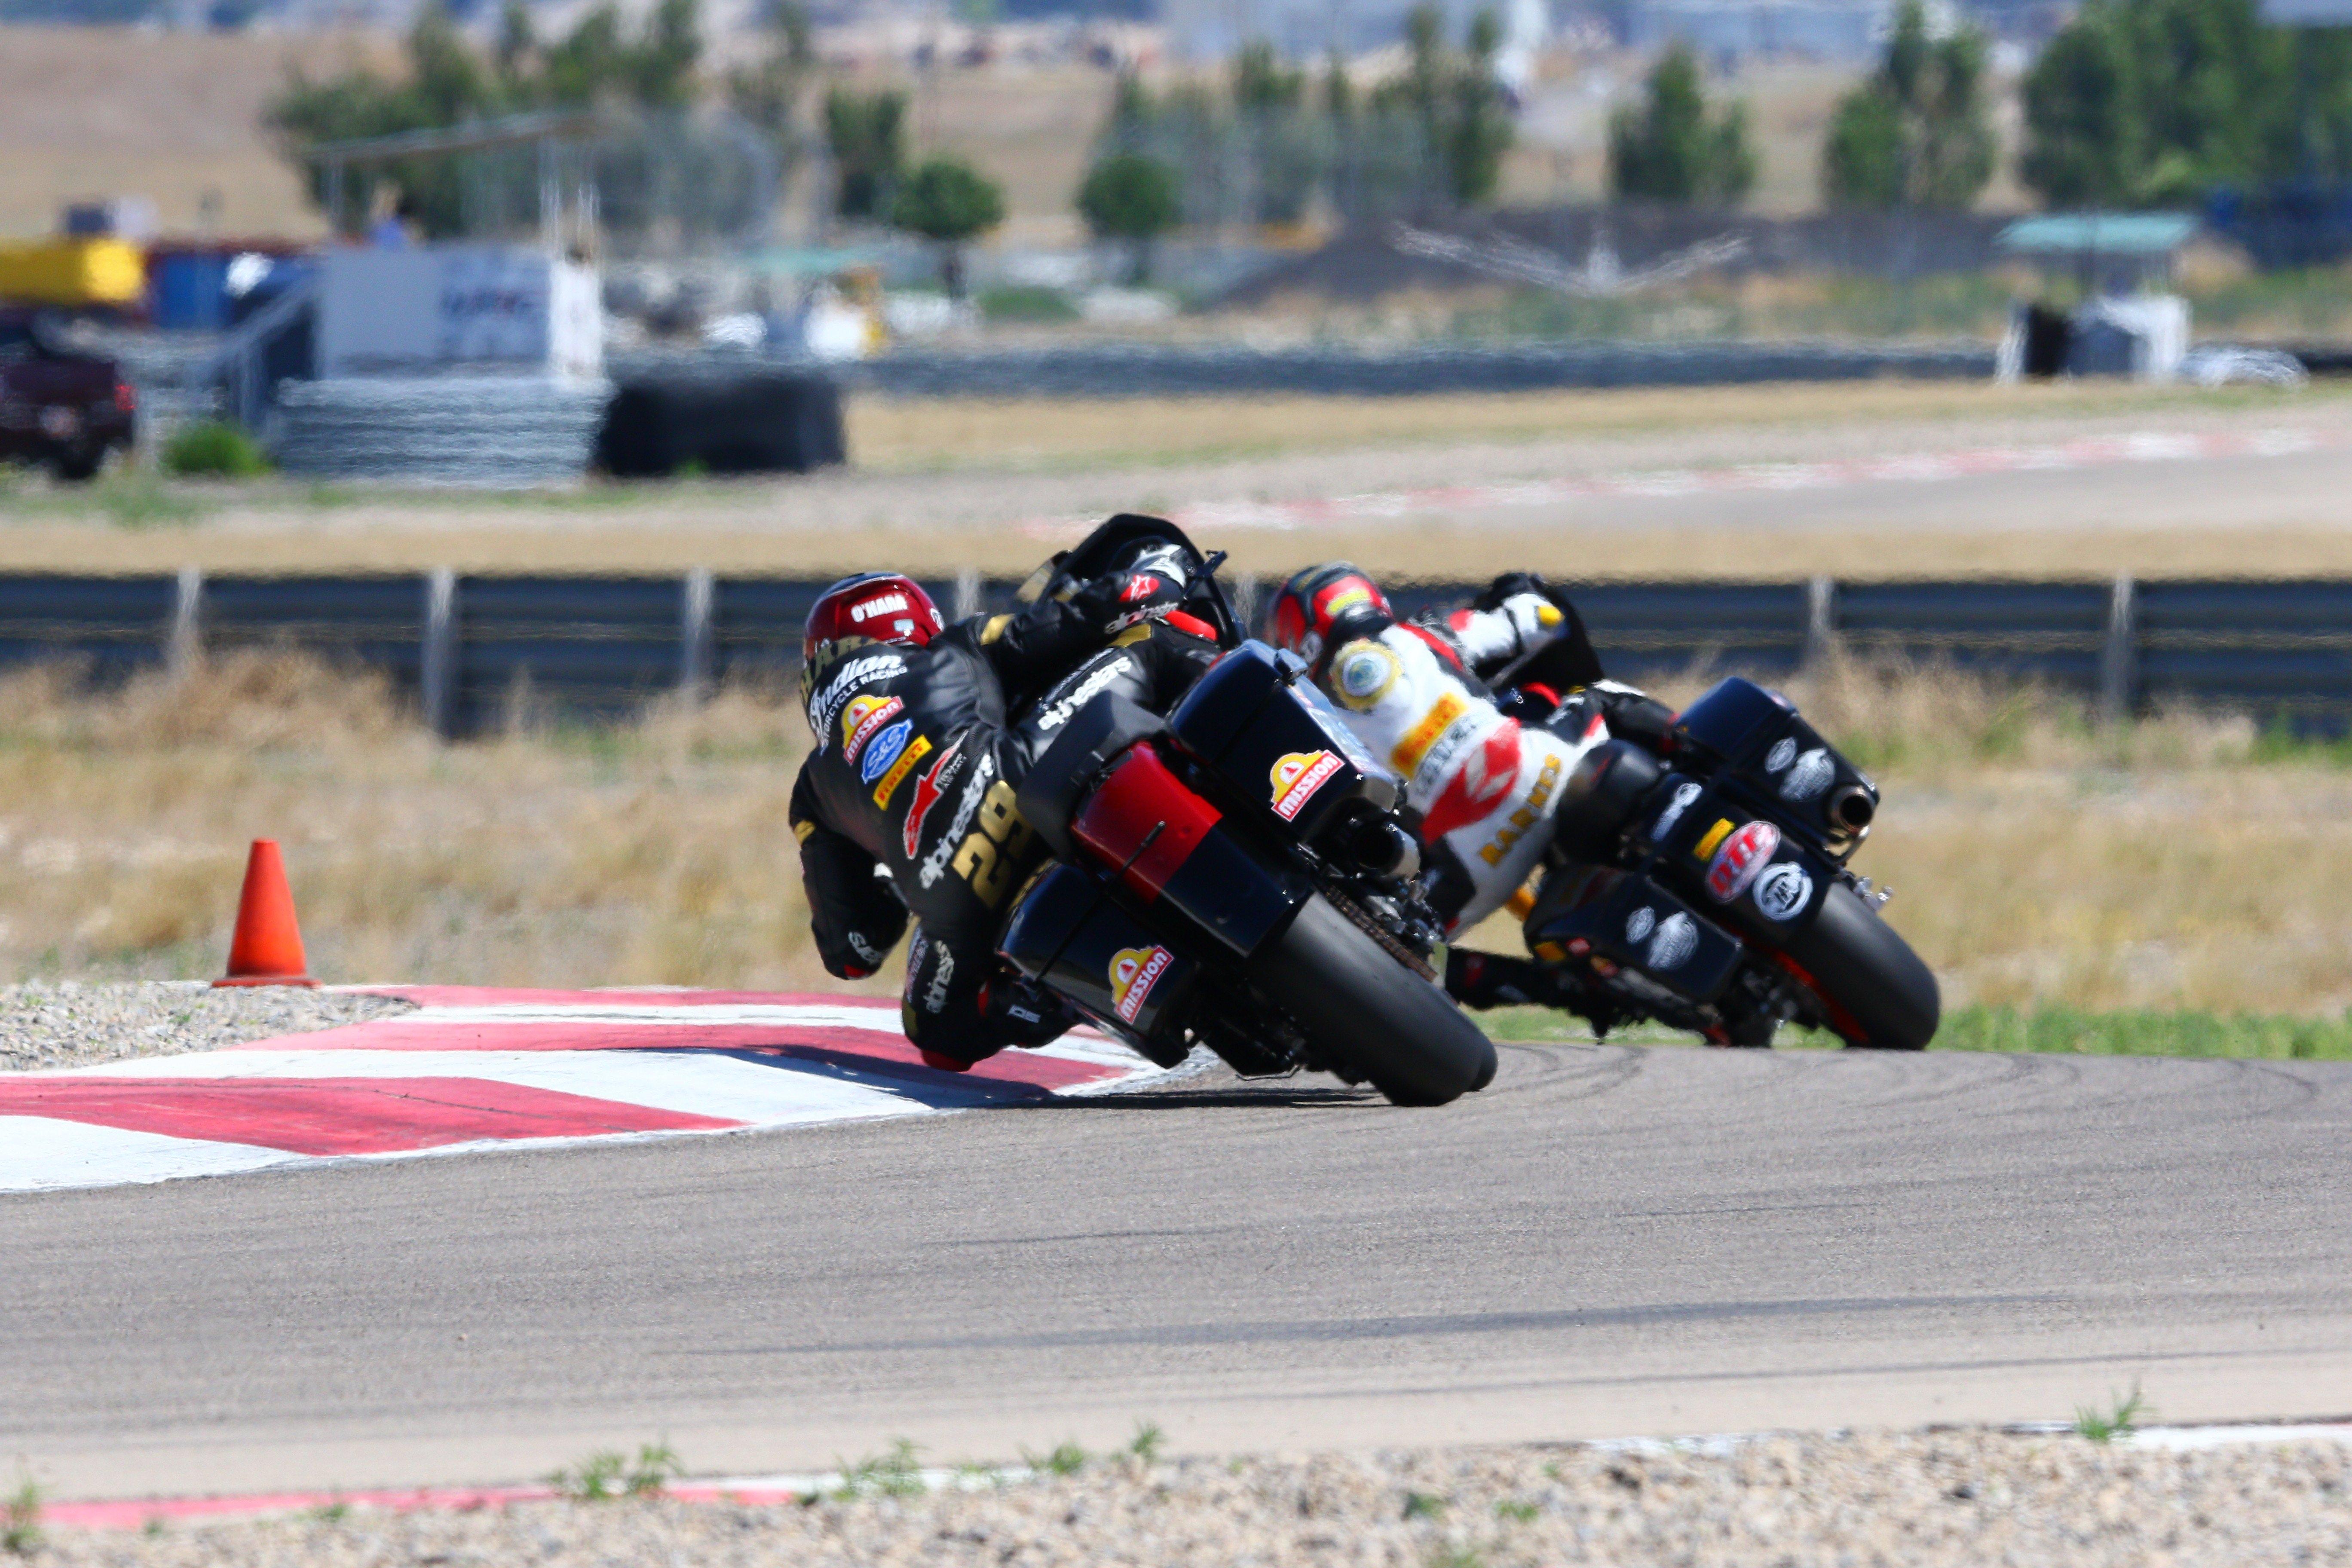 Jun-27-2021-BRL (Sun)-Bagger GP-Race-UMC_2816_Jun2721_225PM_CaliPhoto